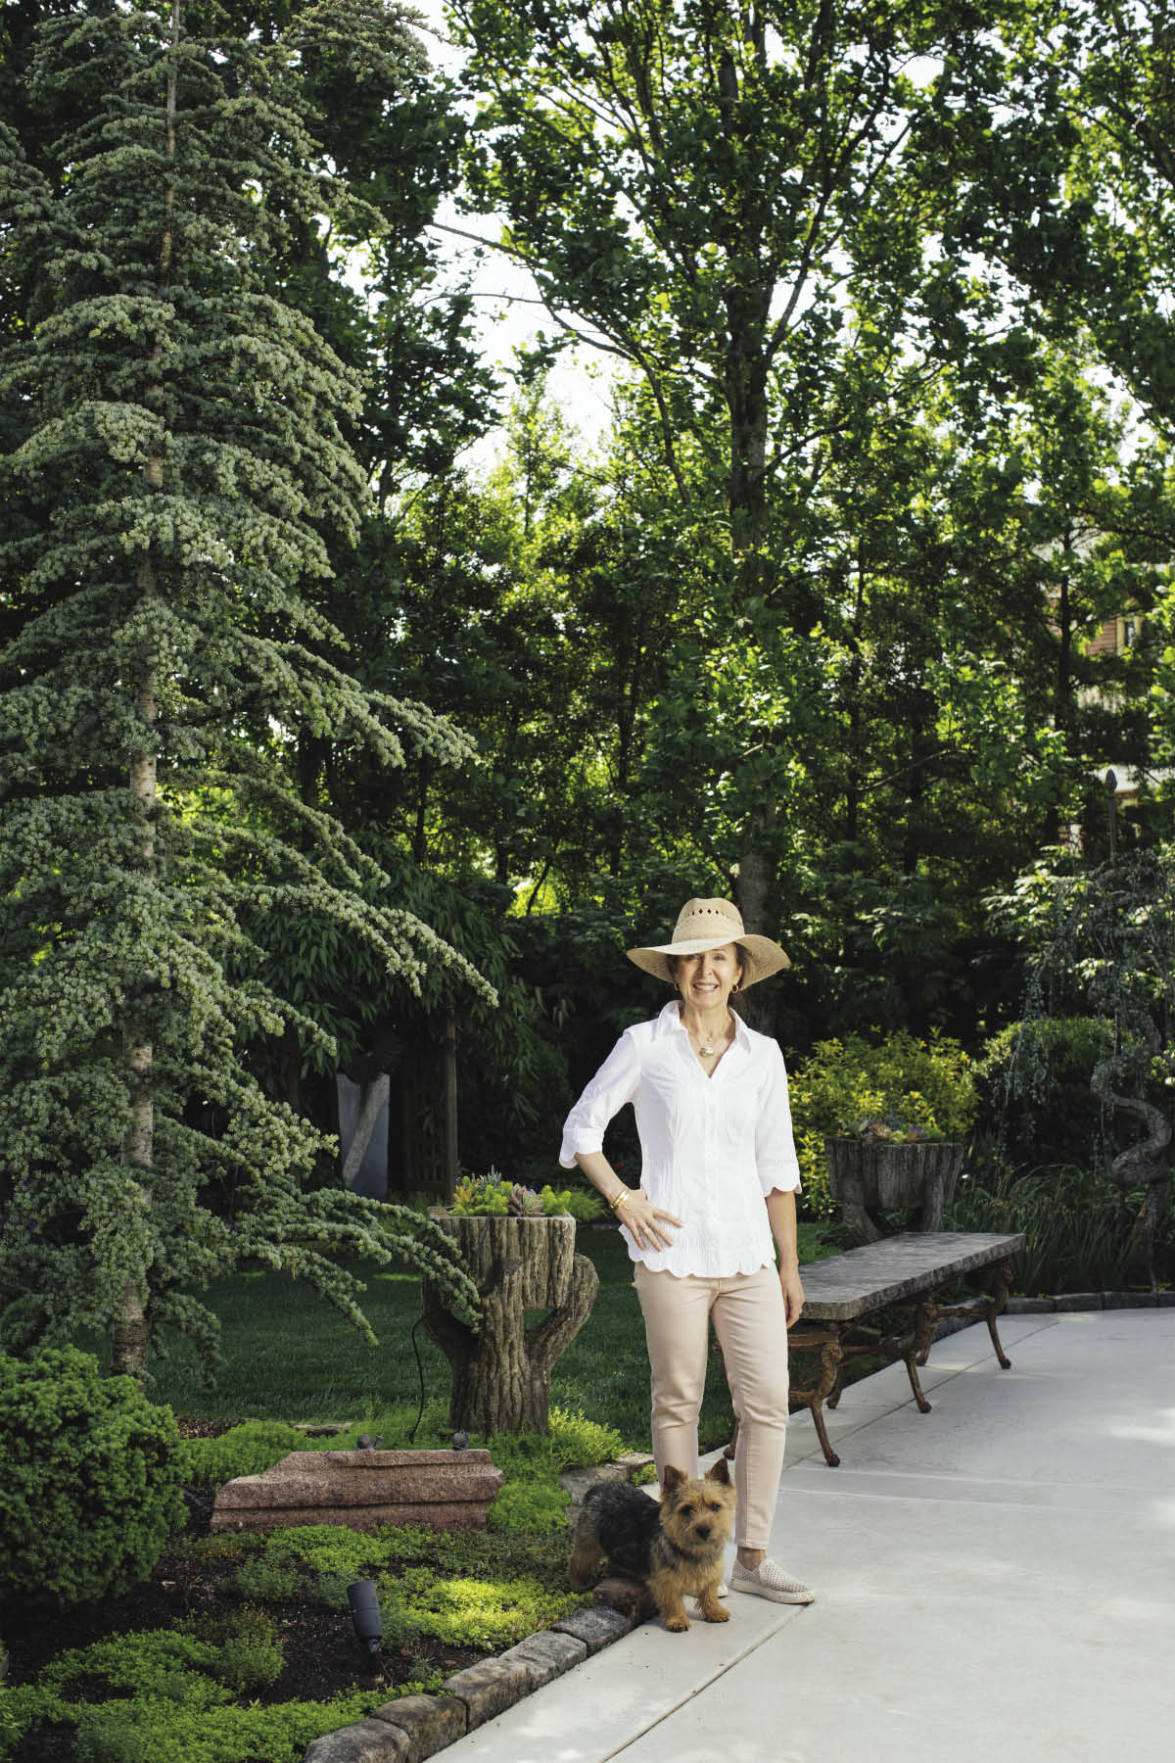 Outdoor Living: The Secret Garden